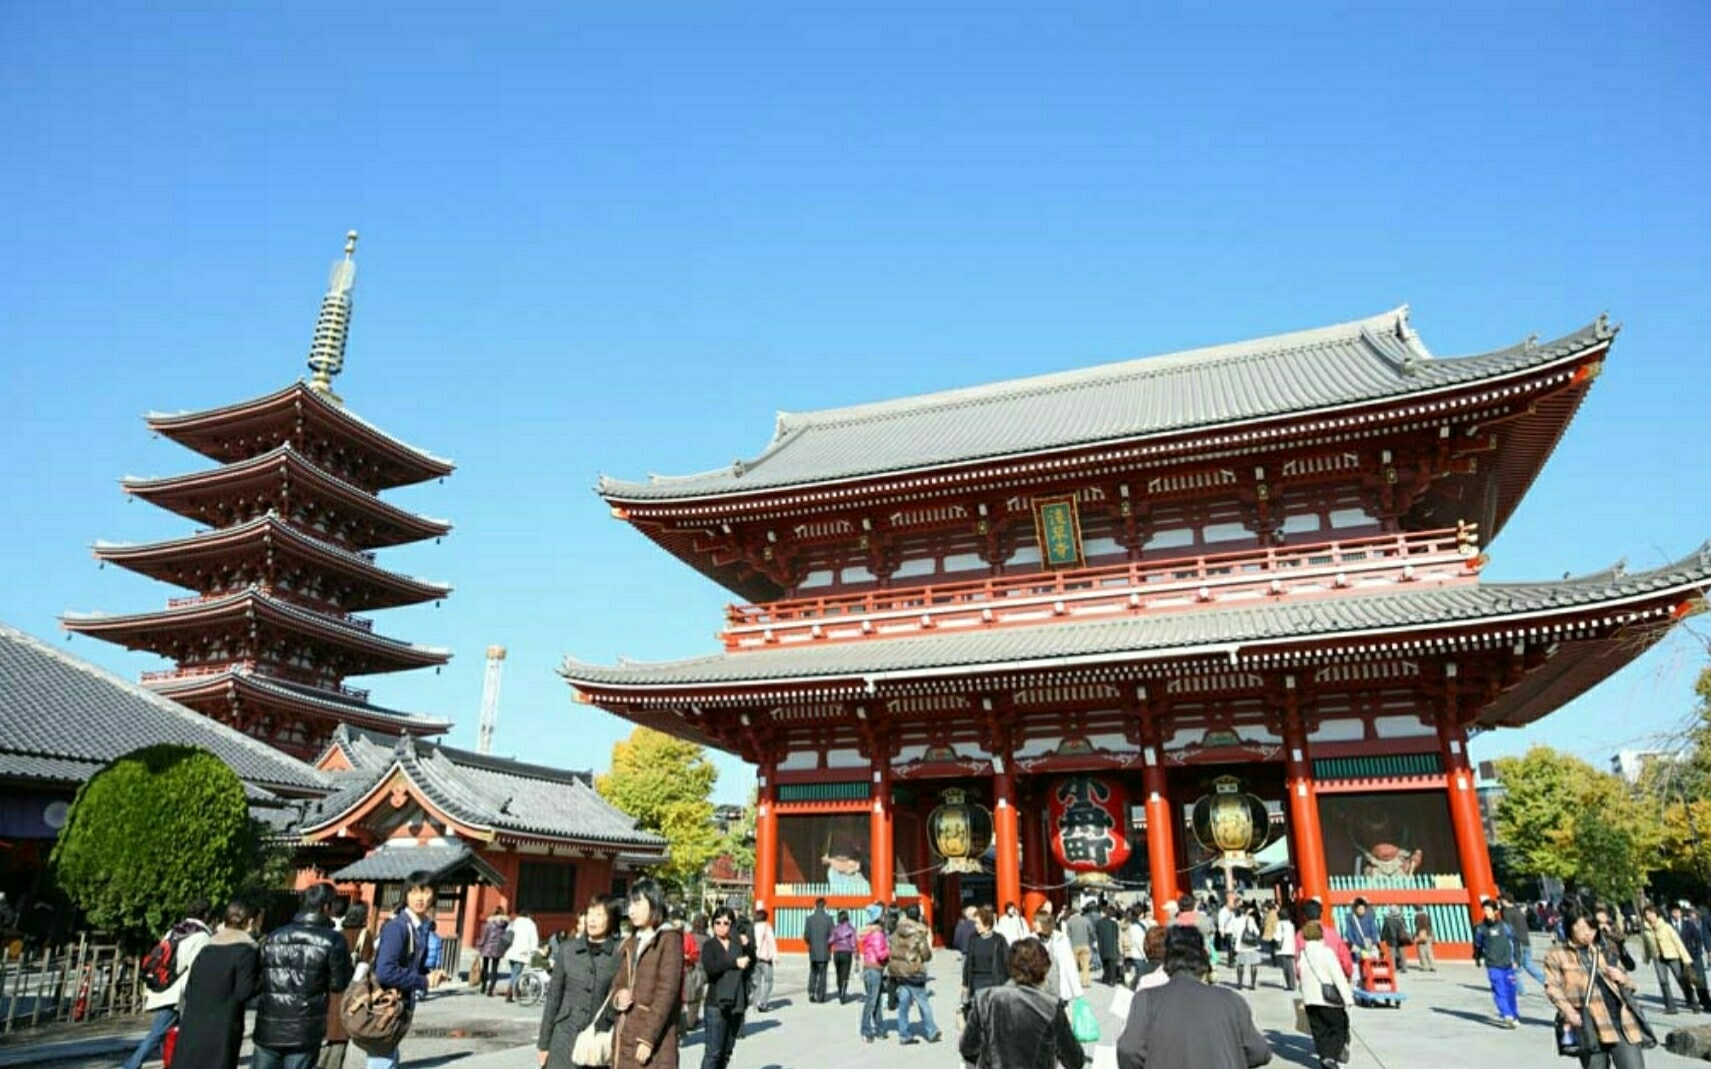 Main gate and Pagoda in Sensouji Temple